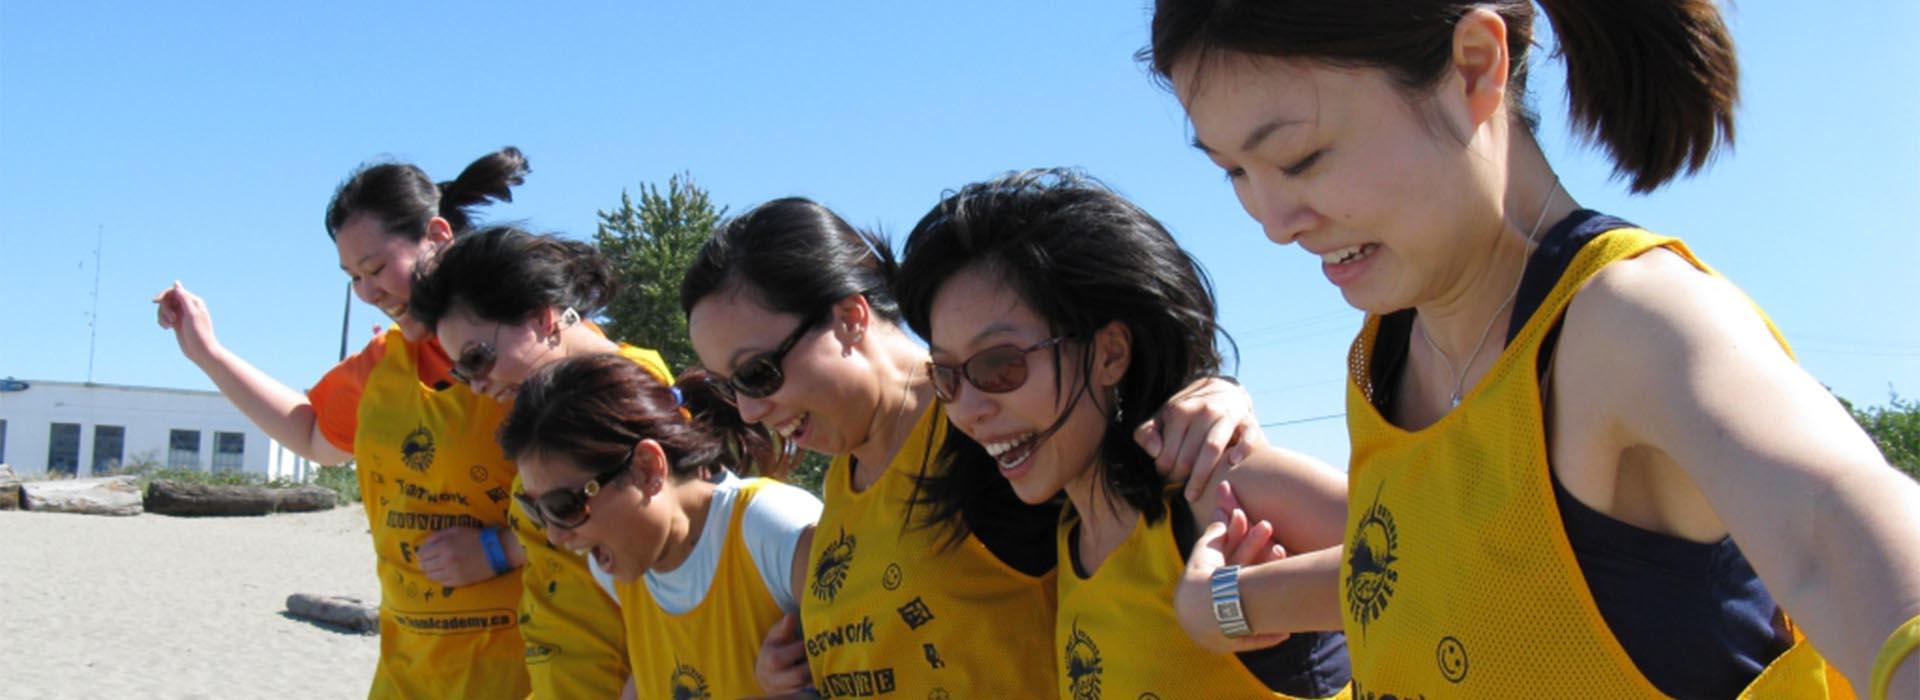 Stimulating Team Bonding and Cooperation